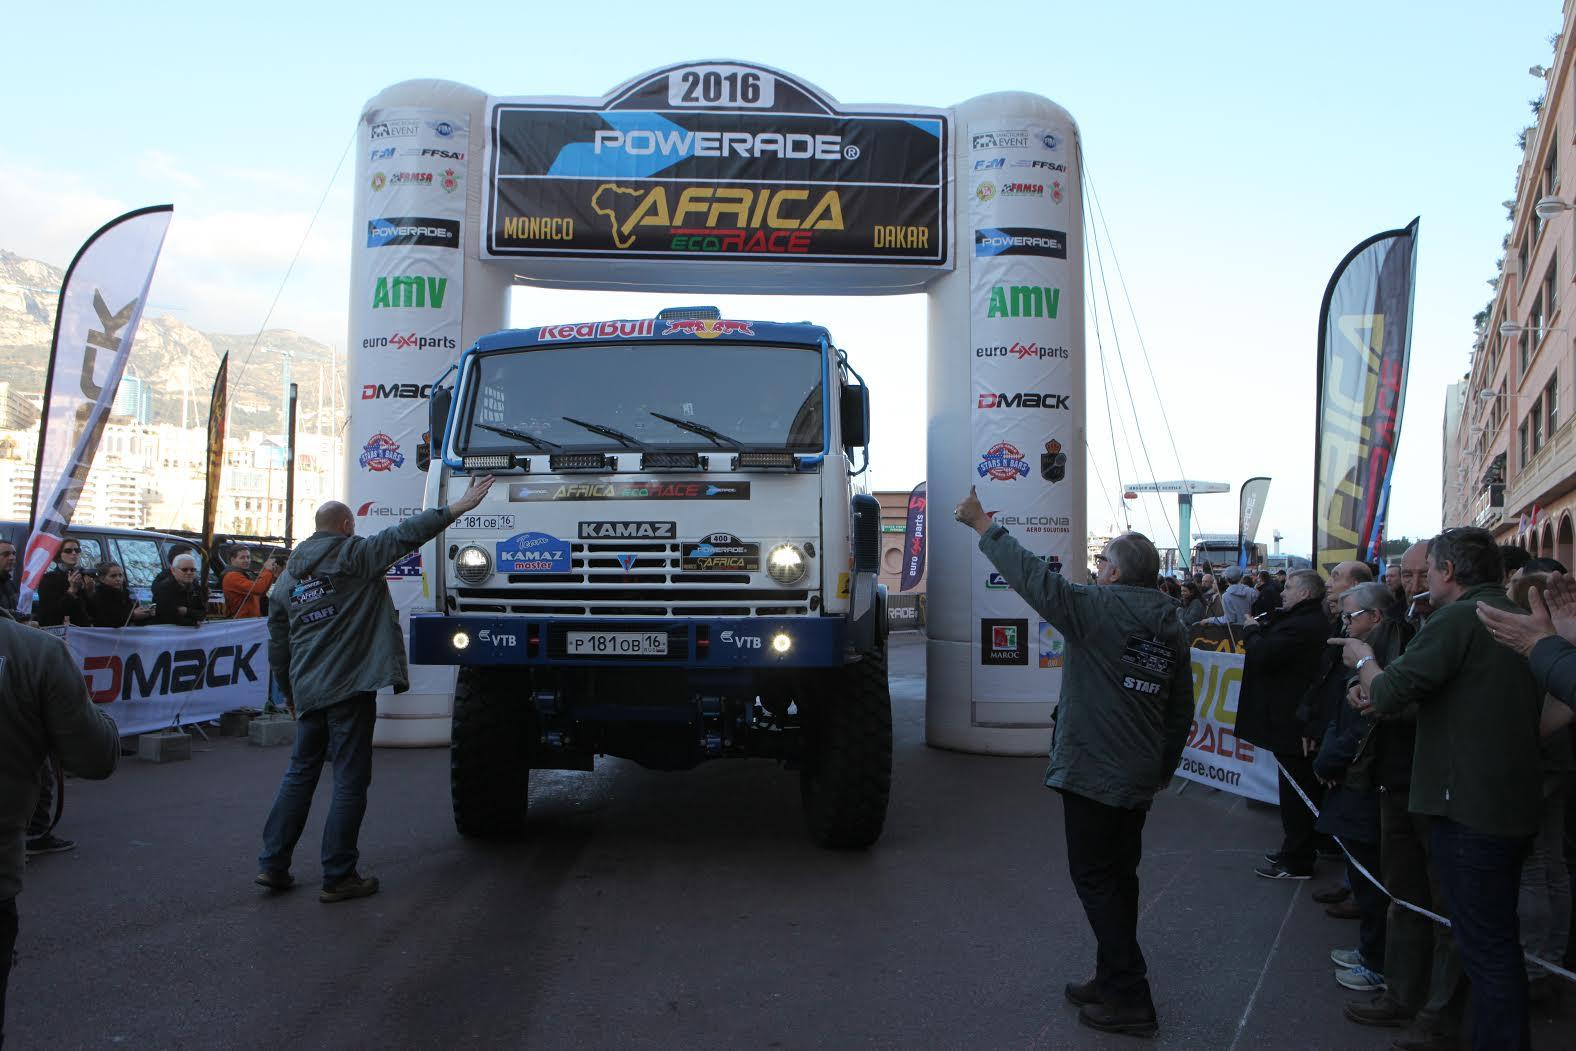 http://www.kamazmaster.ru/uploads/news/AFRICA2016/2/12.jpg